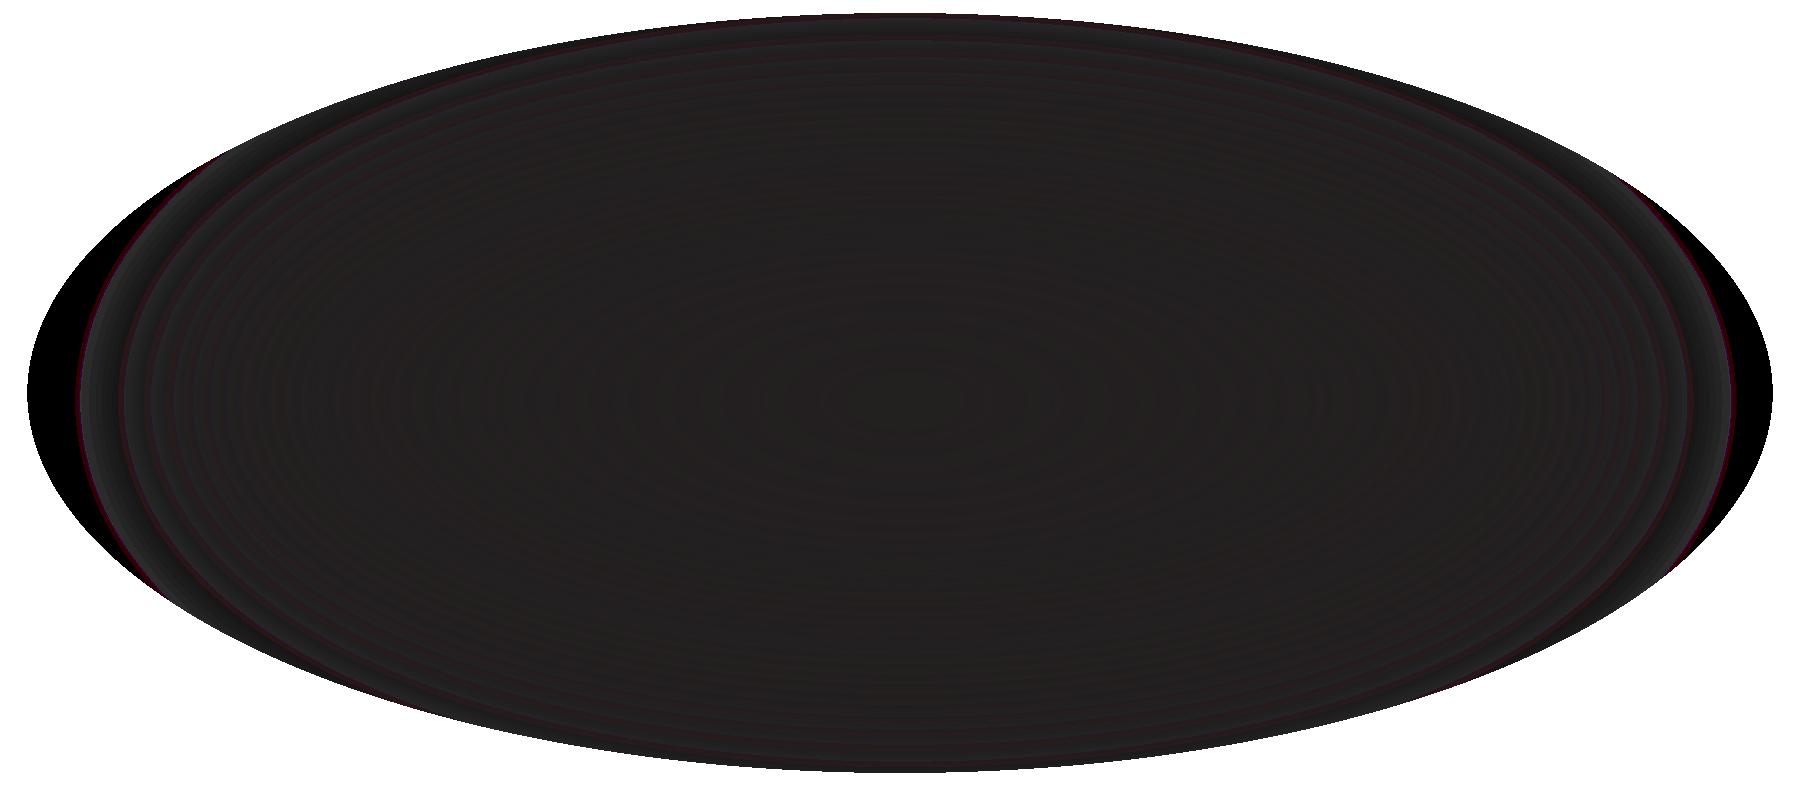 IMG blur